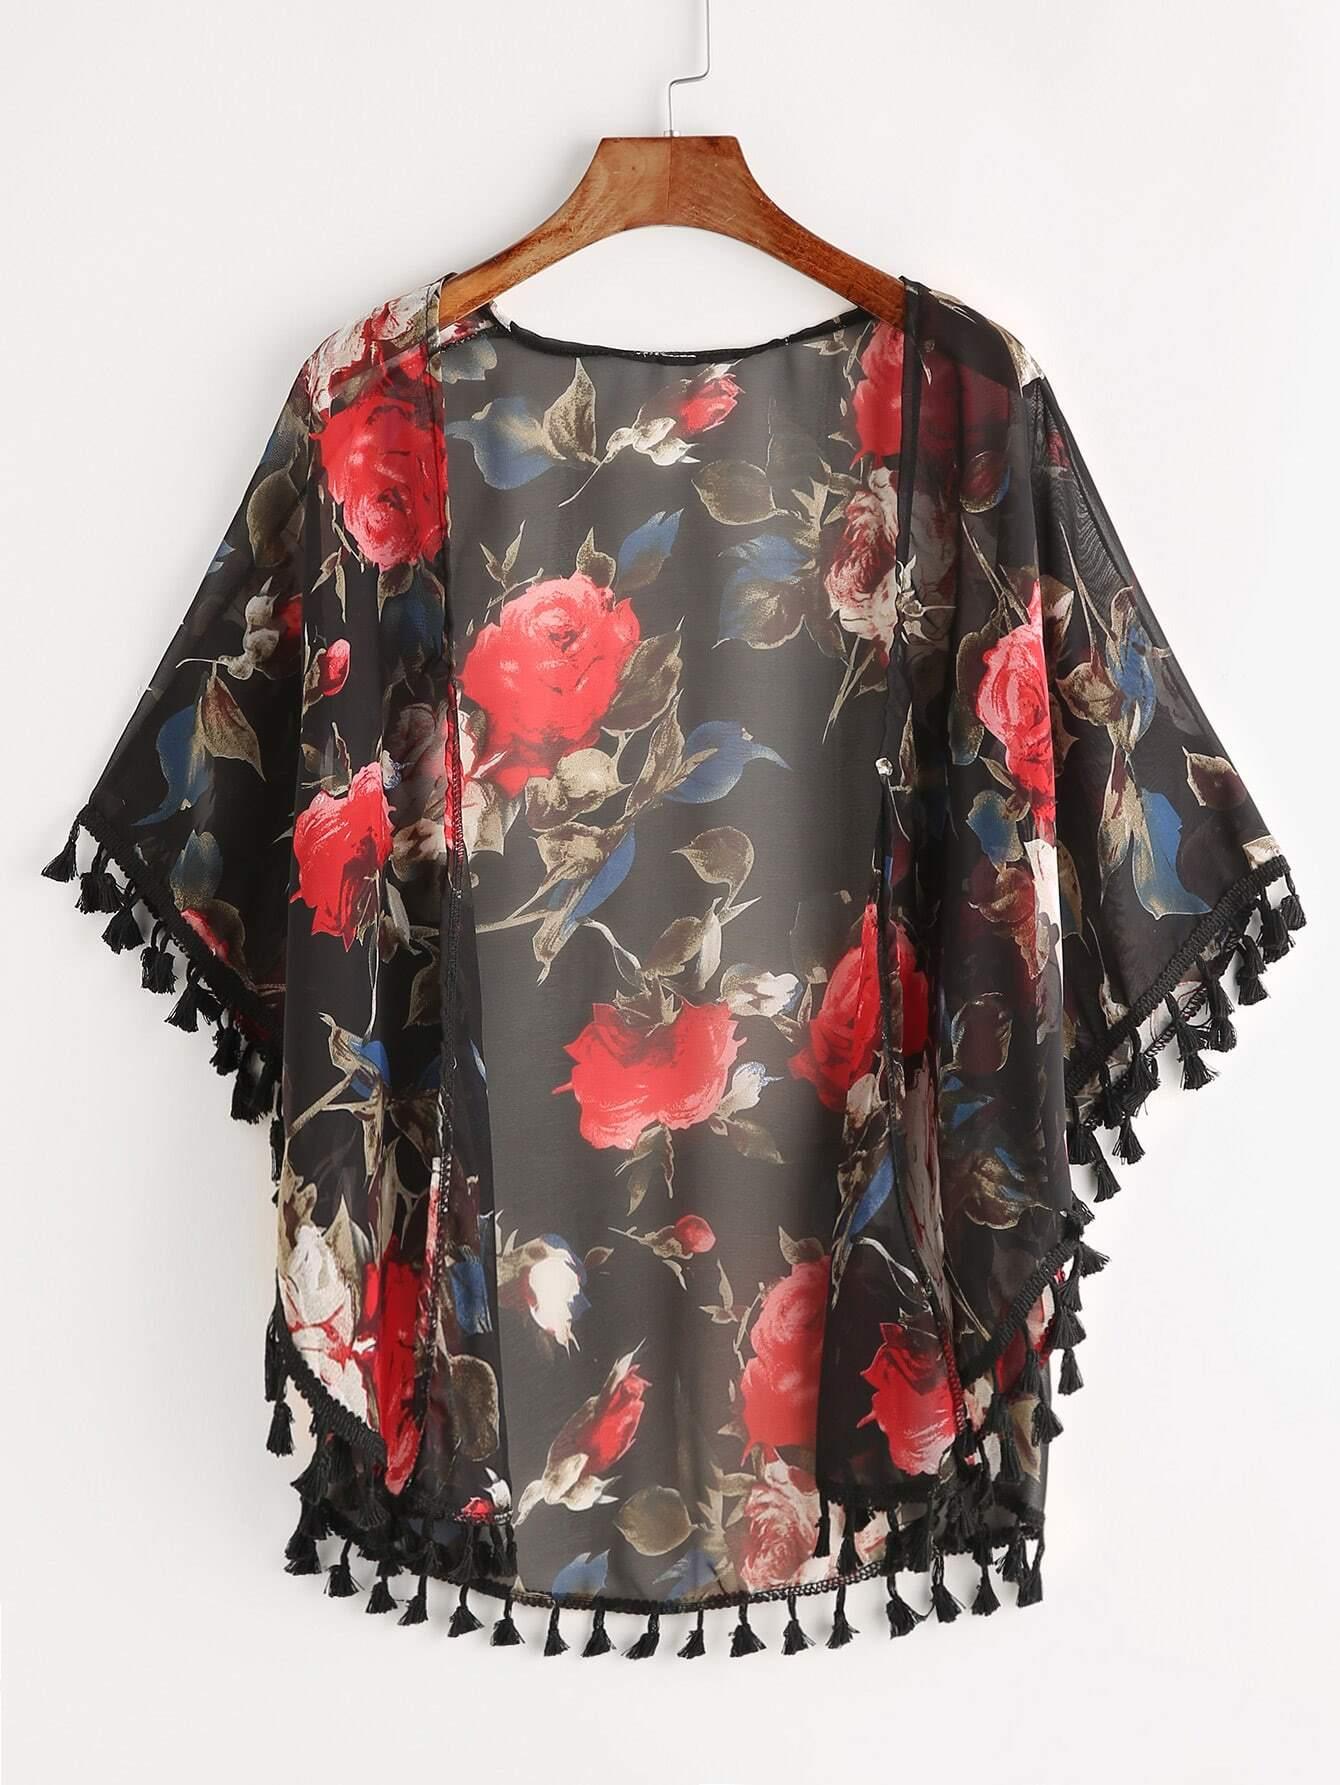 Floral Print Fringe Trim Kimono kimono170421001